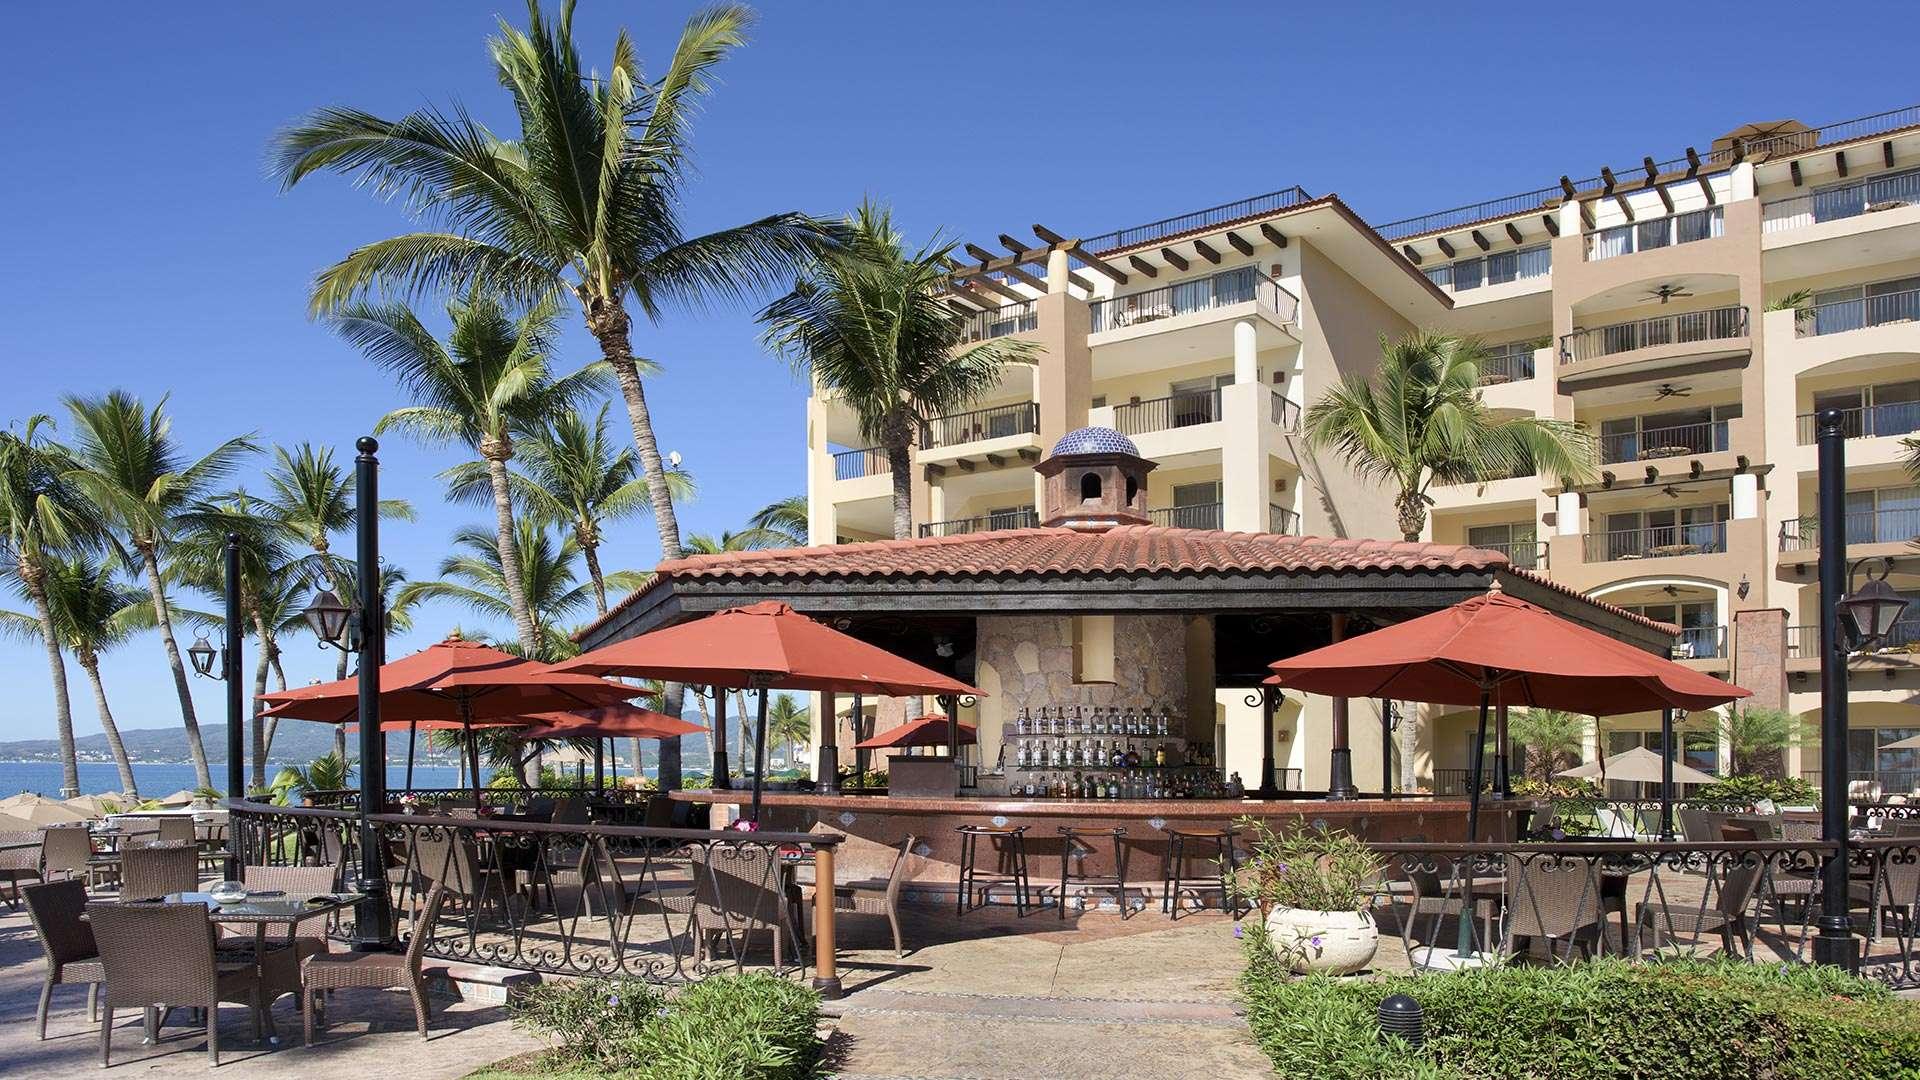 Villa Del Palmar Flamingos Riviera Nayarit Pizza Bar